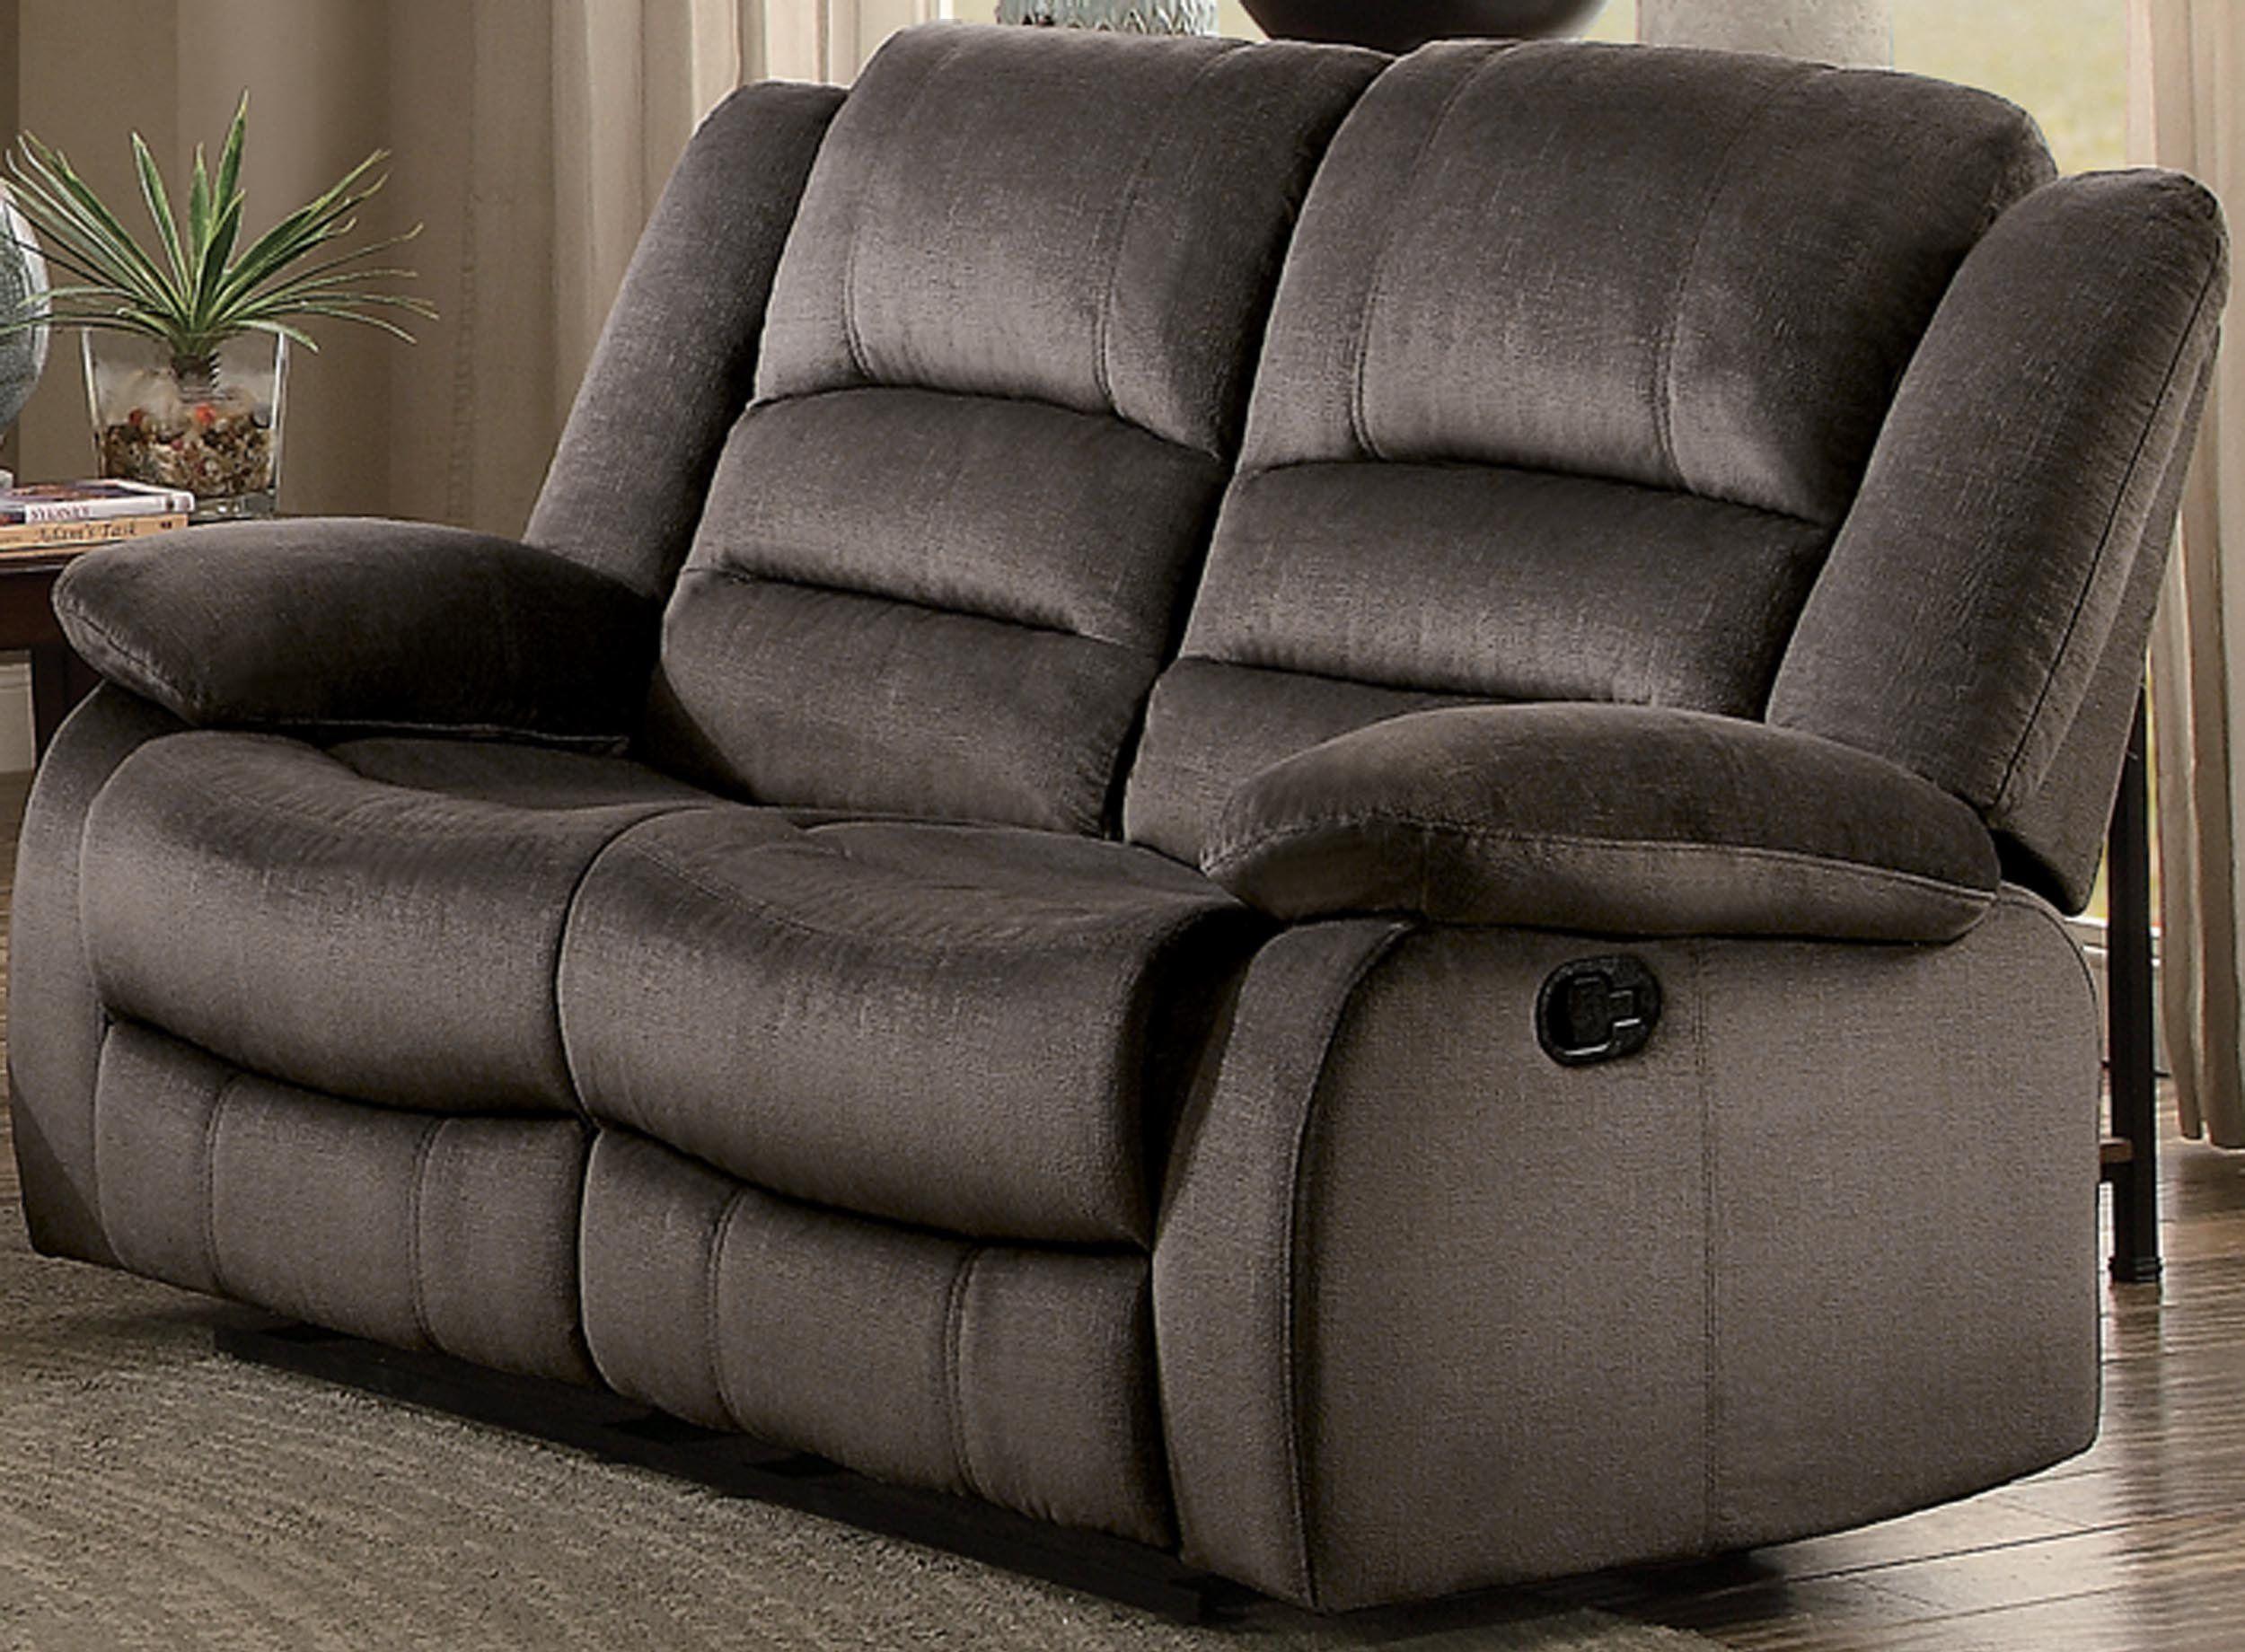 Homelegance jarita reclining loveseat polyester fabric